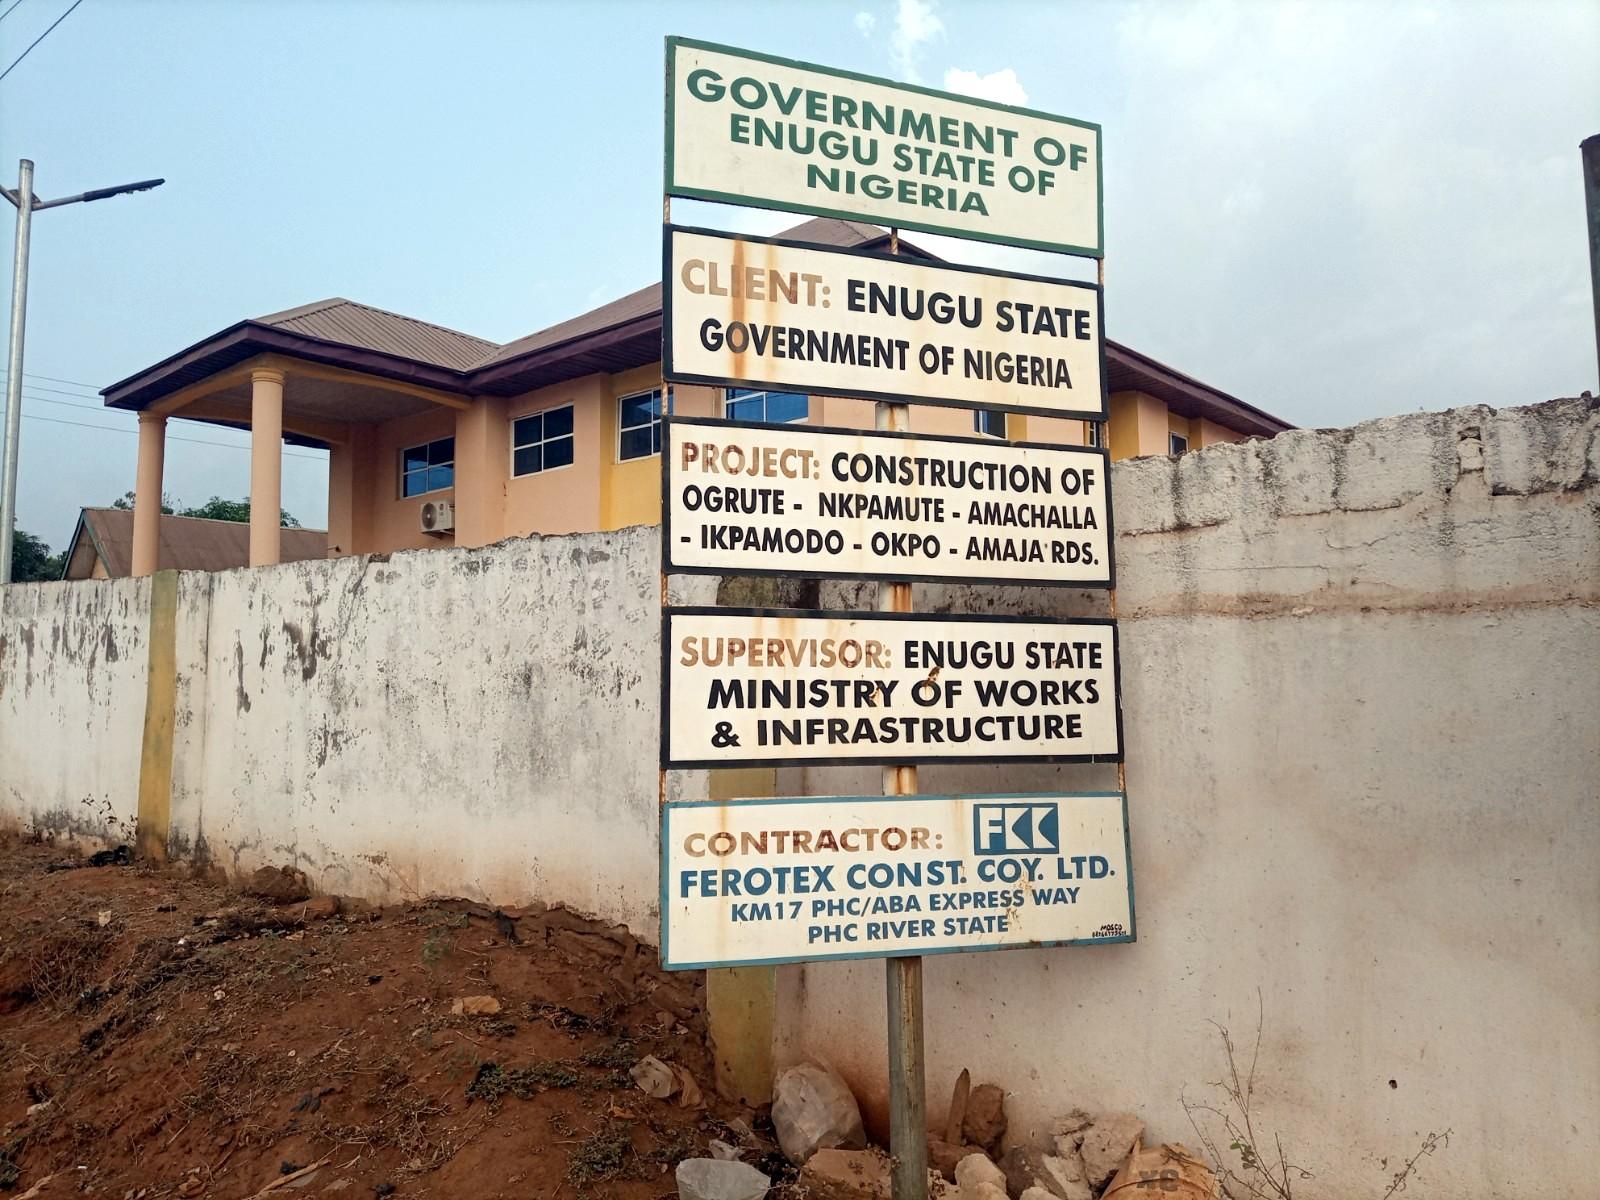 Project signpost mounted at Ogrute, Enugu Ezike.